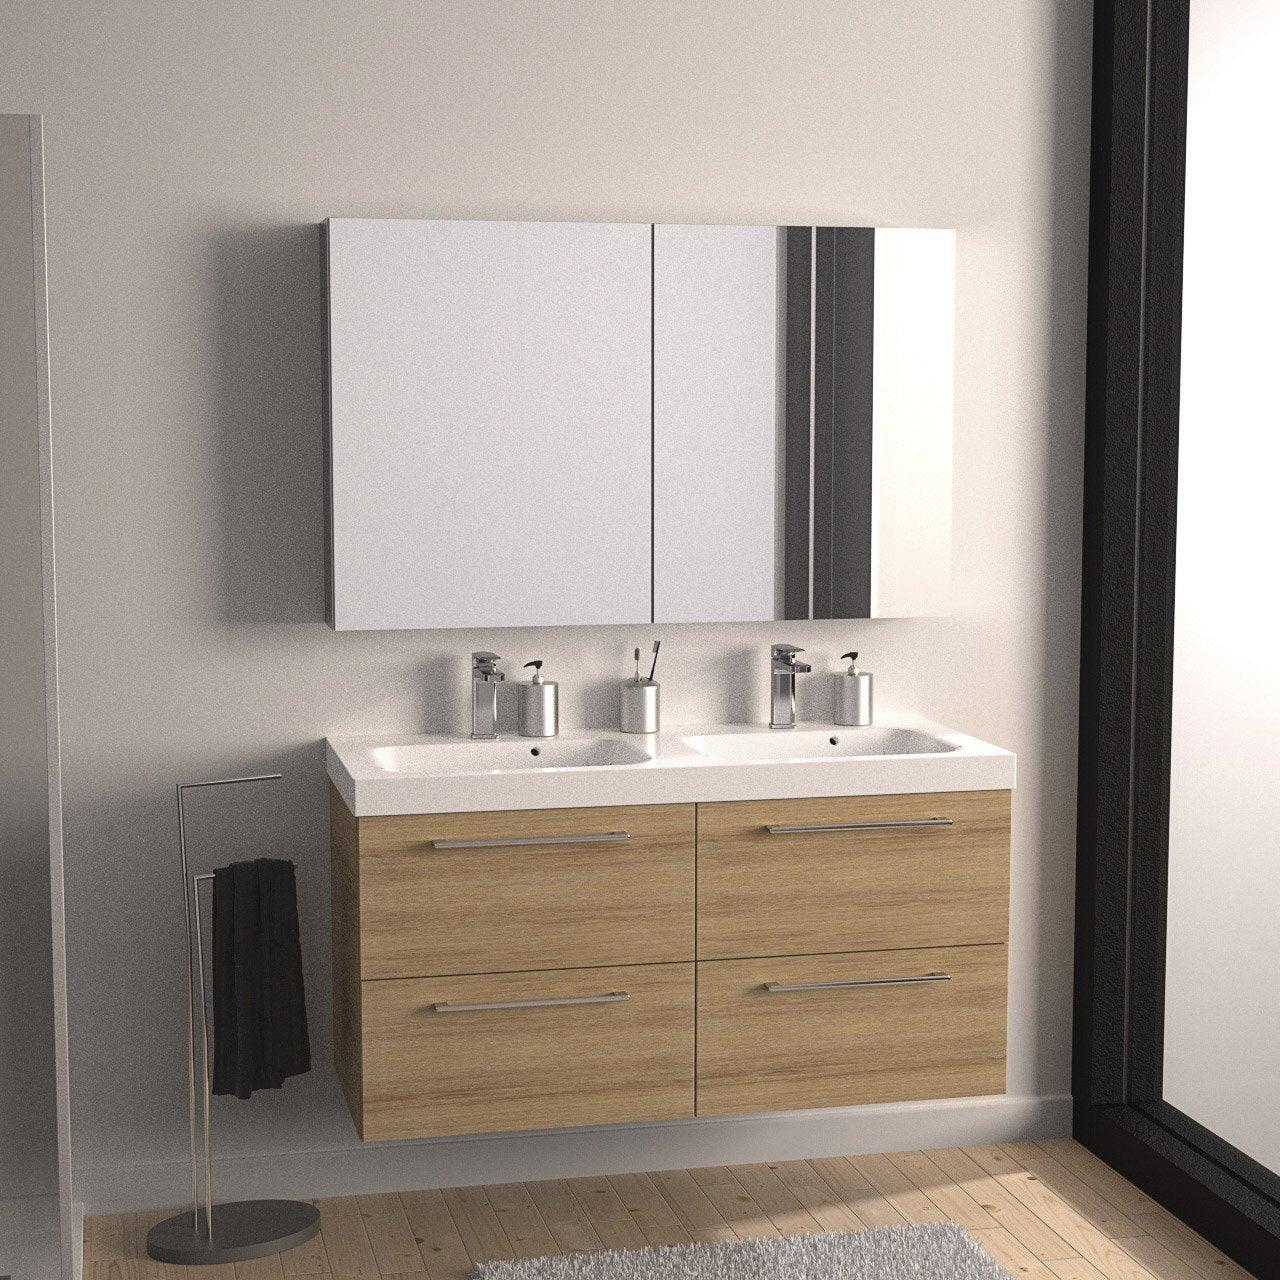 Meuble salle de bain sanijura halo - Leroy merlin salle de bain meuble ...